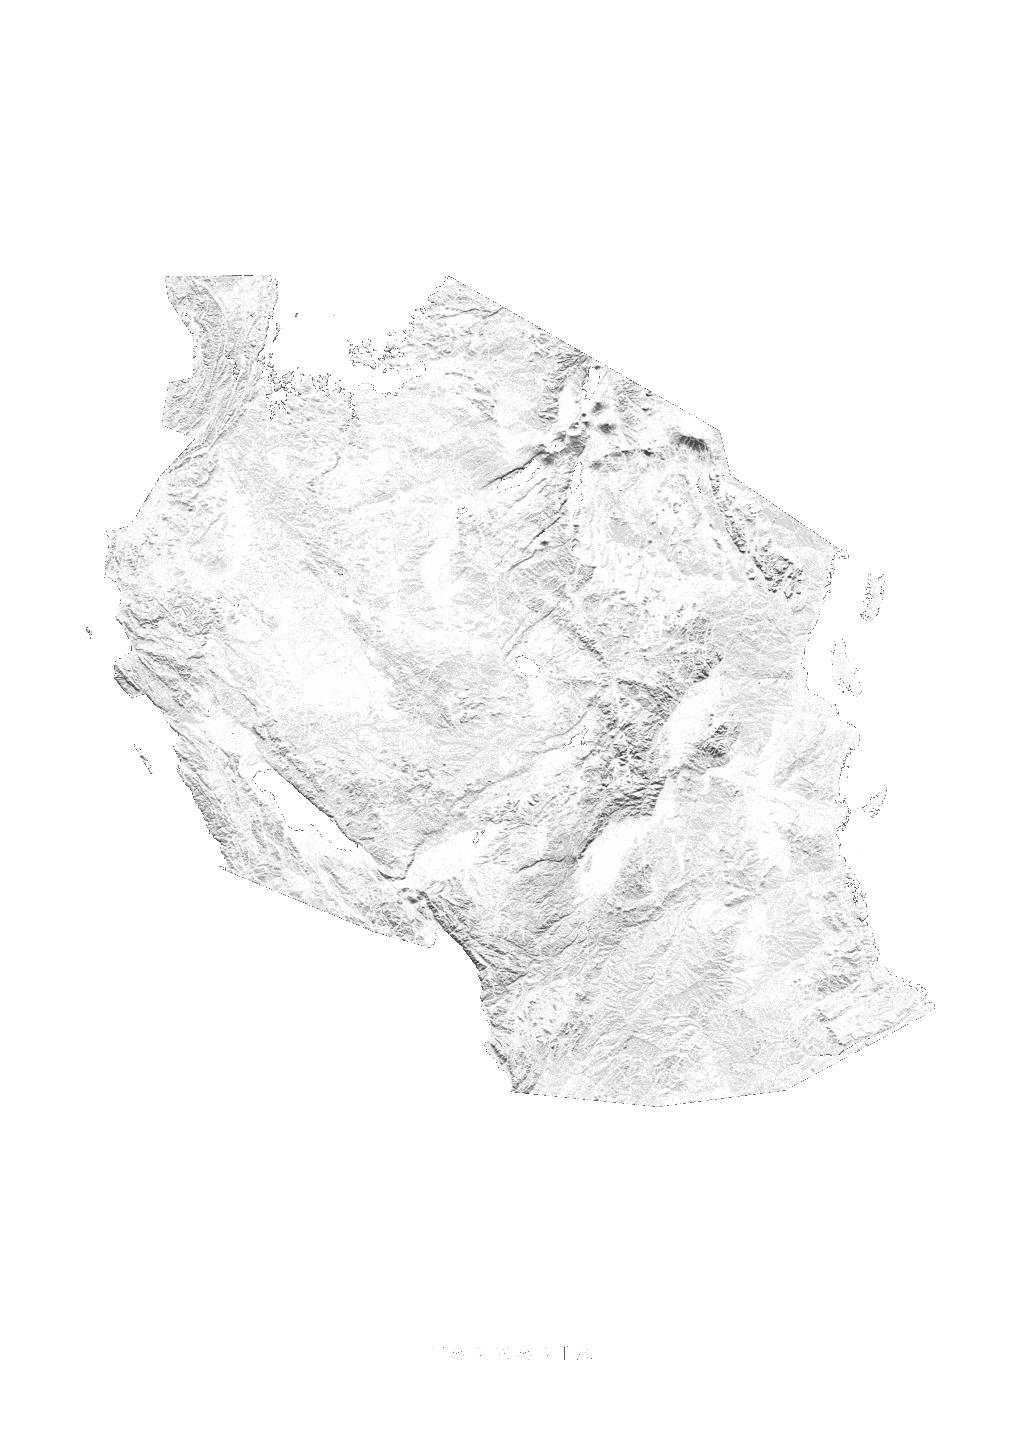 Tanzania wall map